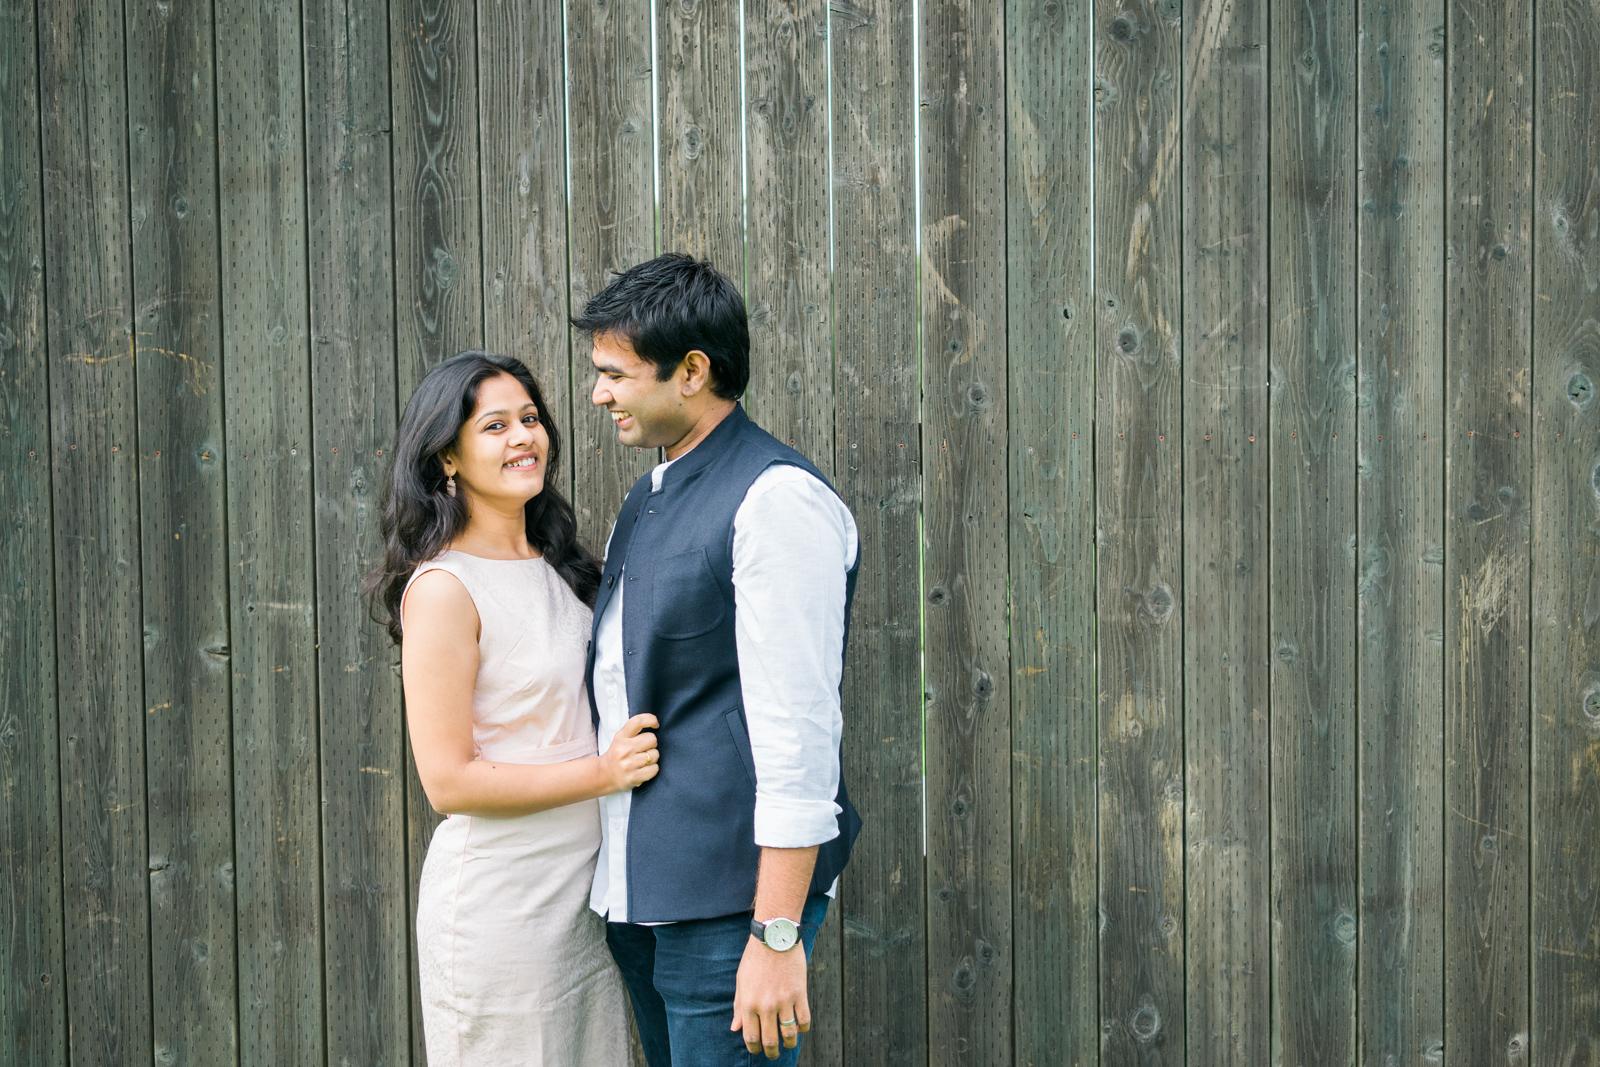 Gorgeous Couple Vrinda & Dhawal | Valentine's Lifestyle Photoshoot at Baylands Park, Sunnyvale, California